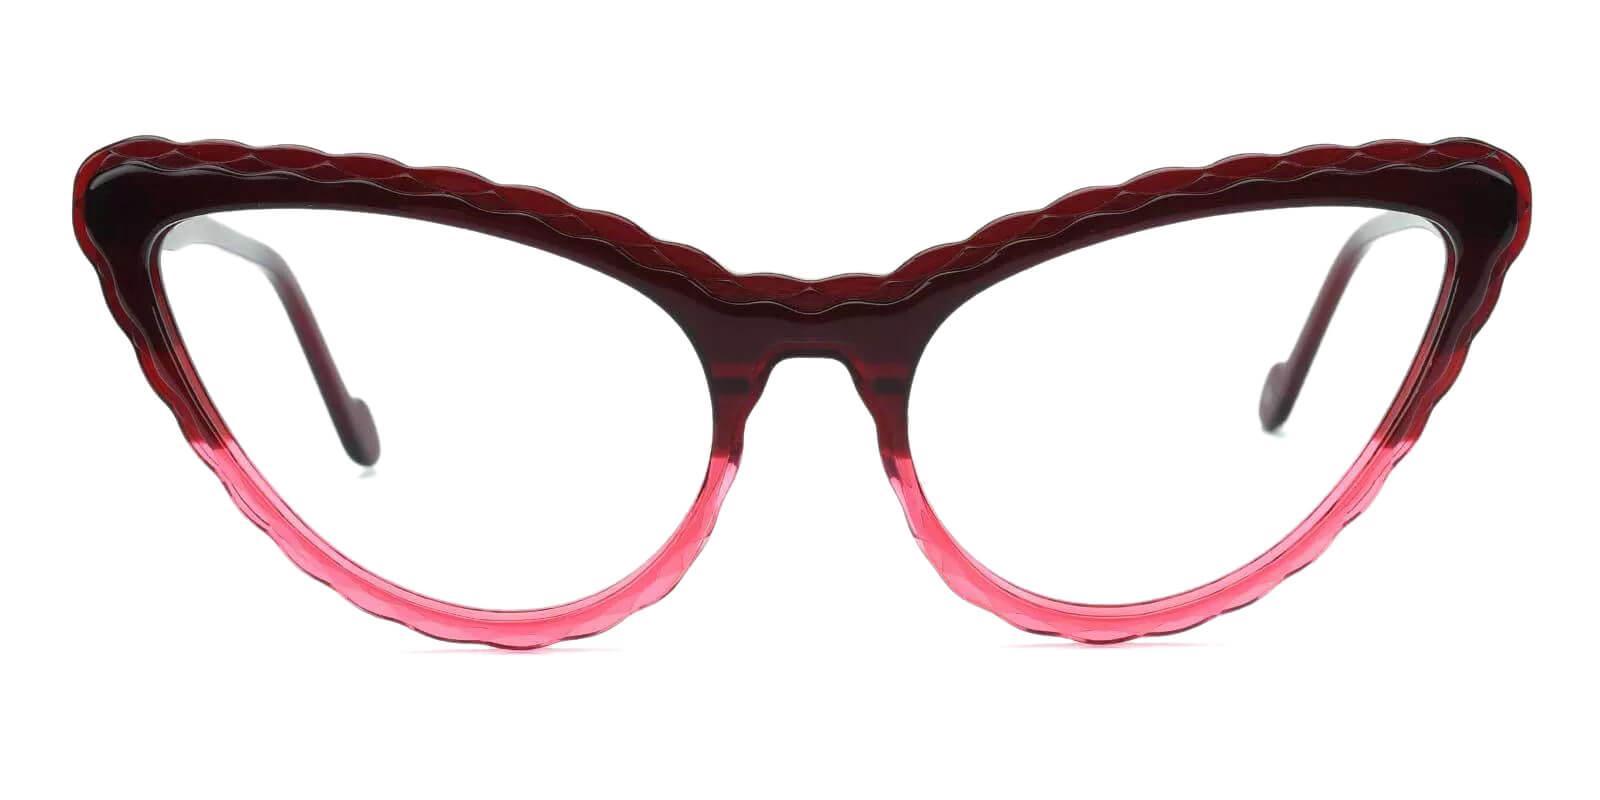 Harmt Purple Acetate Eyeglasses , Fashion , SpringHinges , UniversalBridgeFit Frames from ABBE Glasses